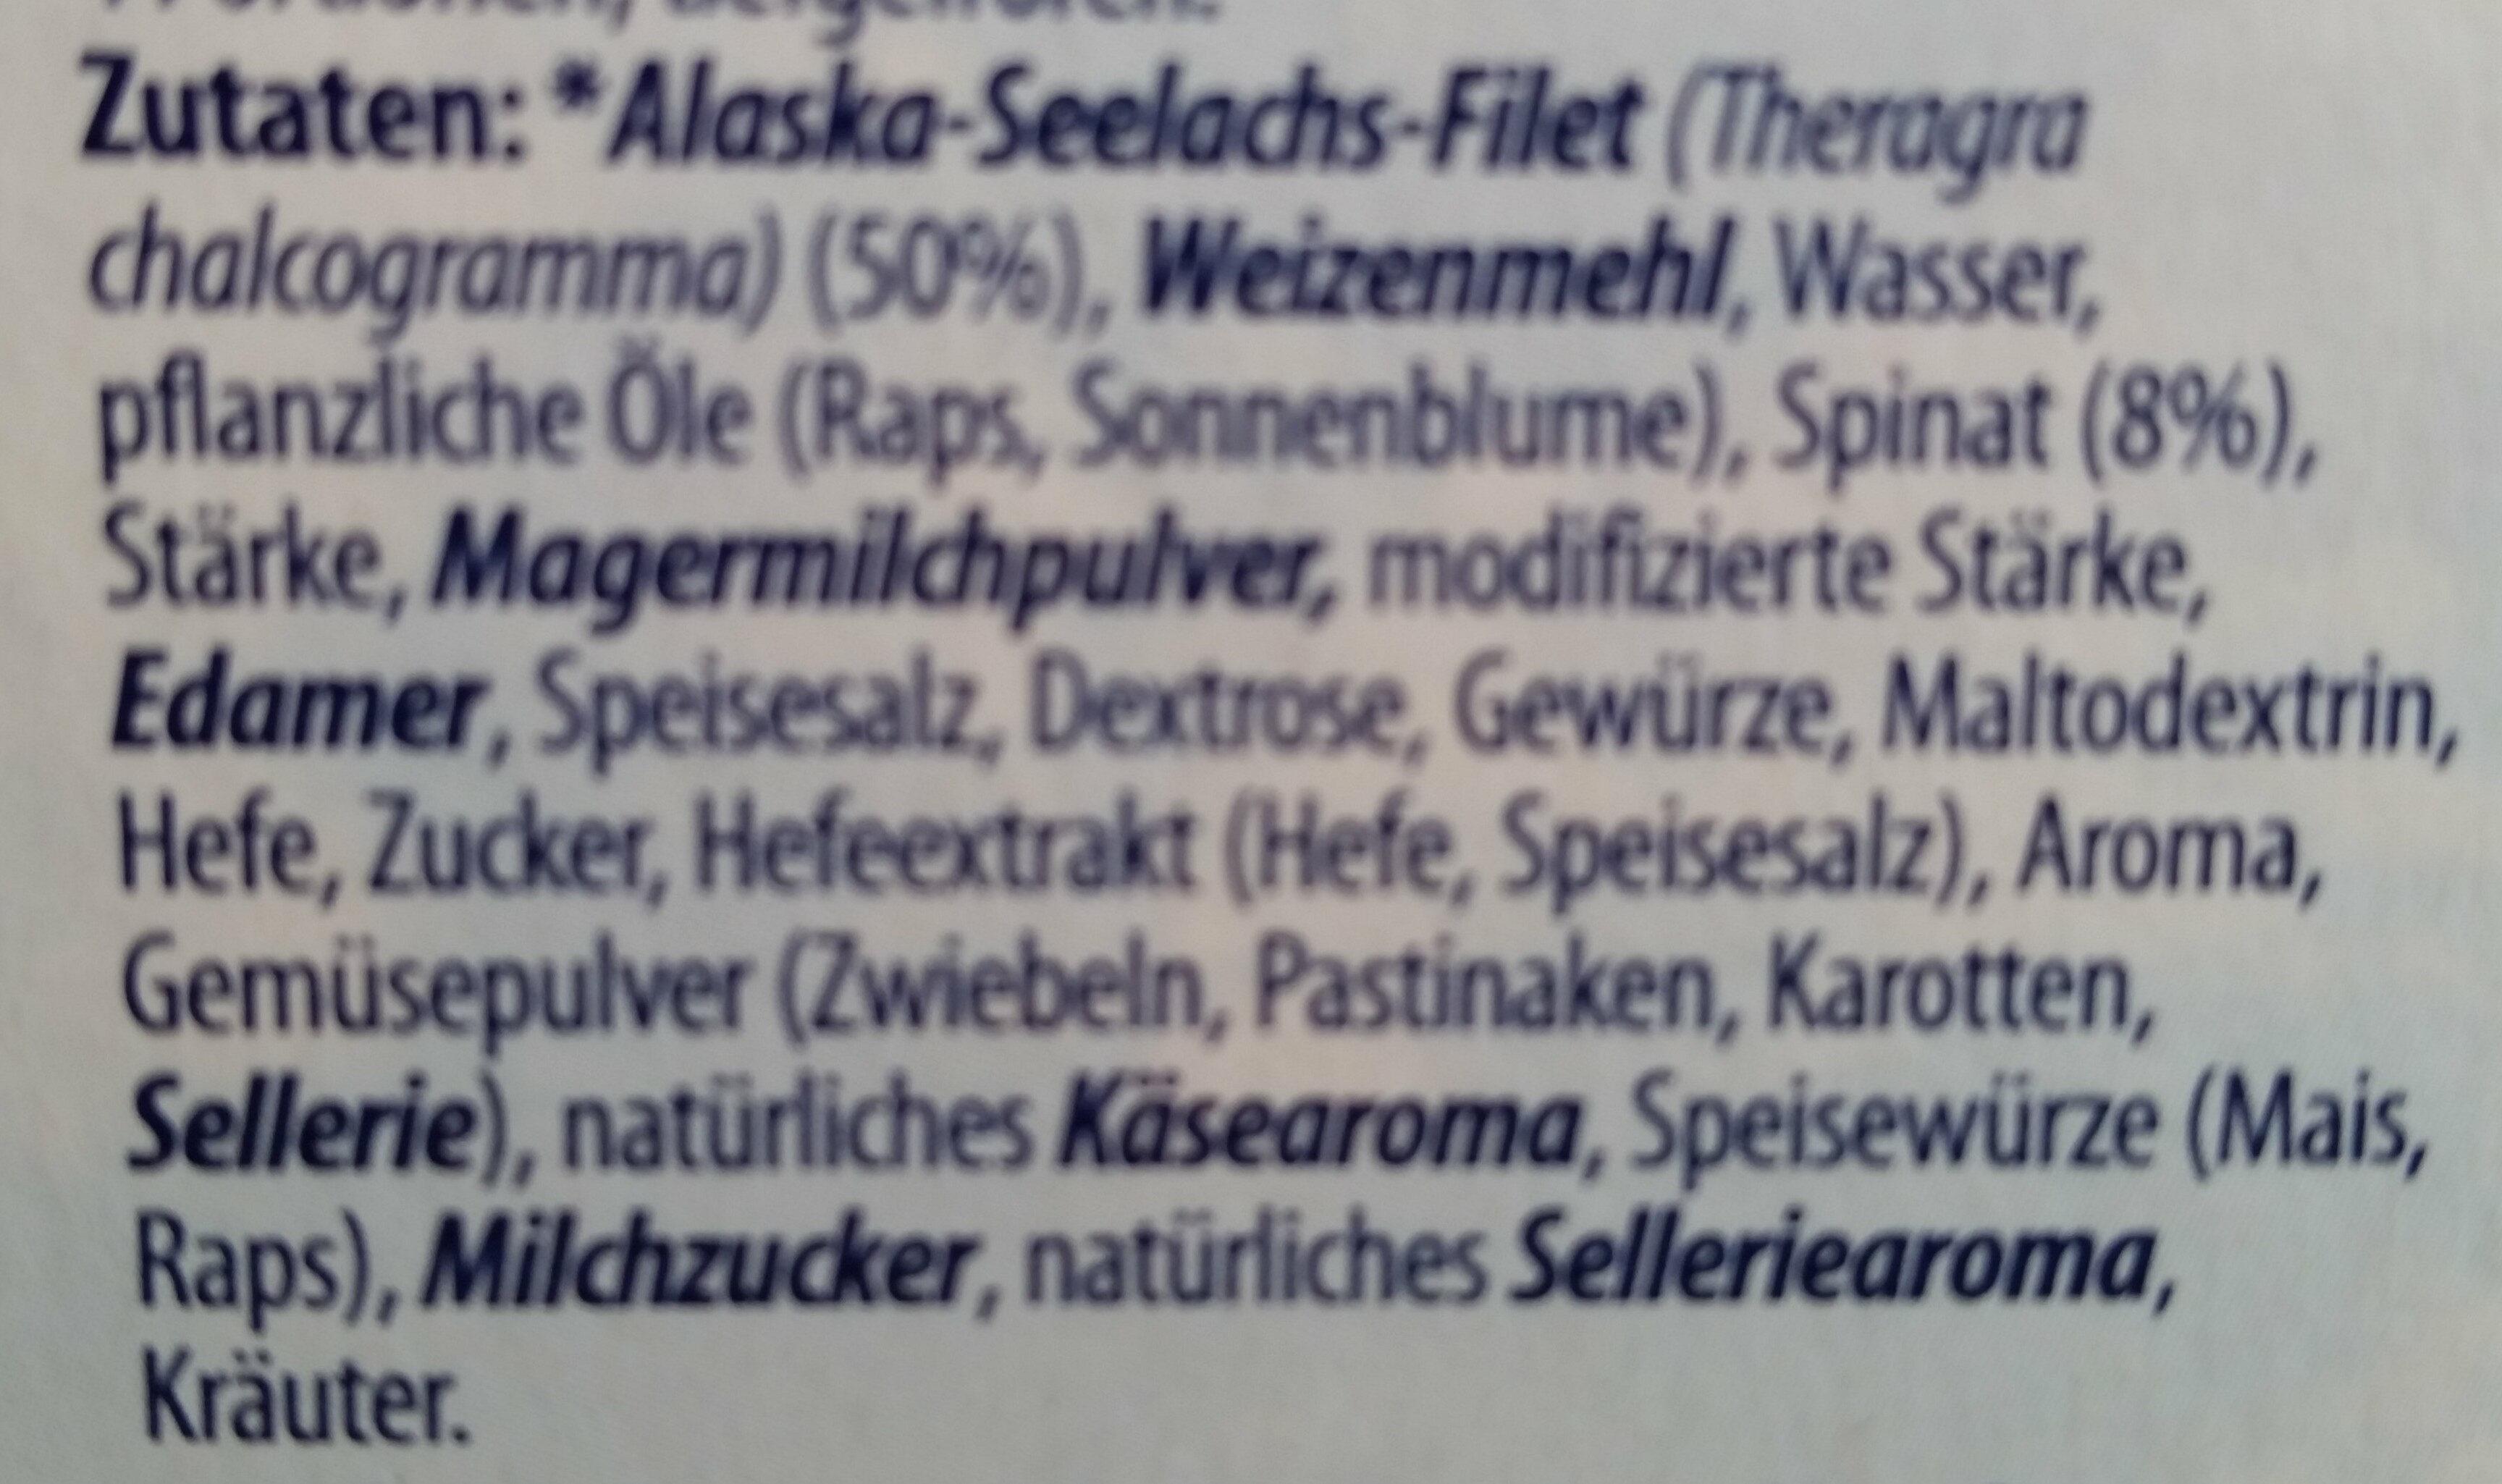 Knusper-Filet Spinat - Ingredients